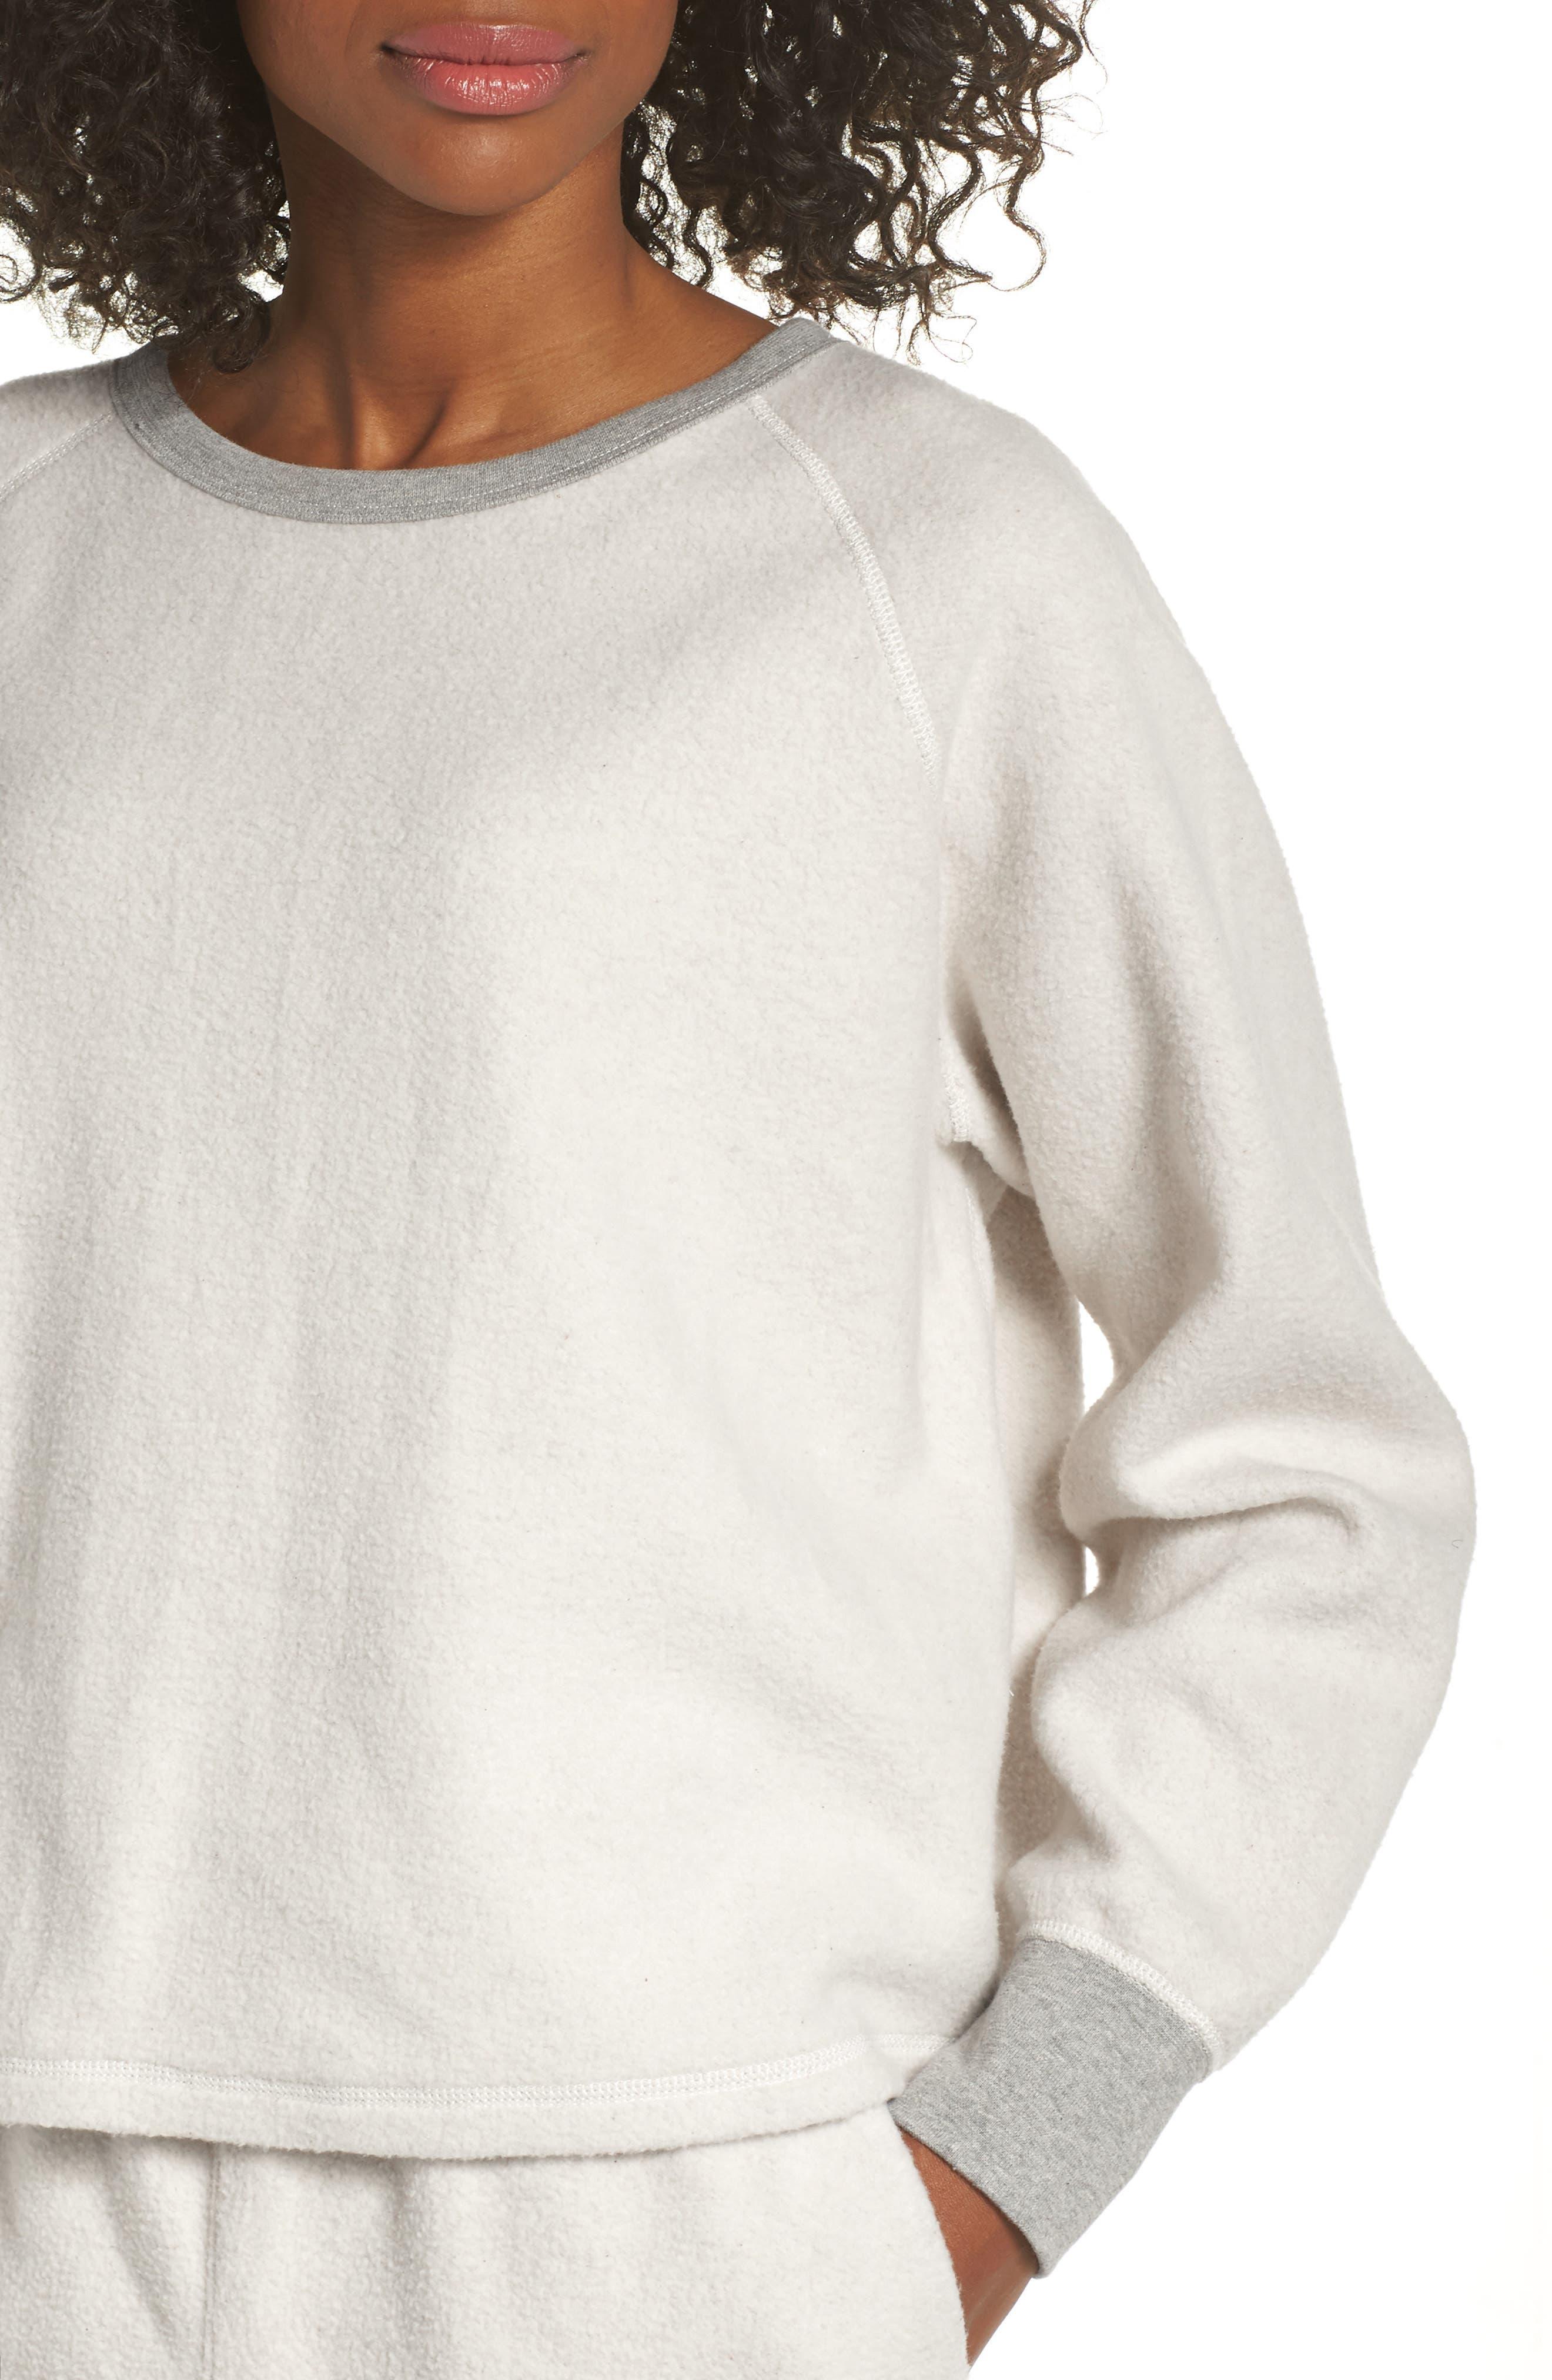 MADEWELL, Fleece Pajama Sweatshirt, Alternate thumbnail 4, color, 020